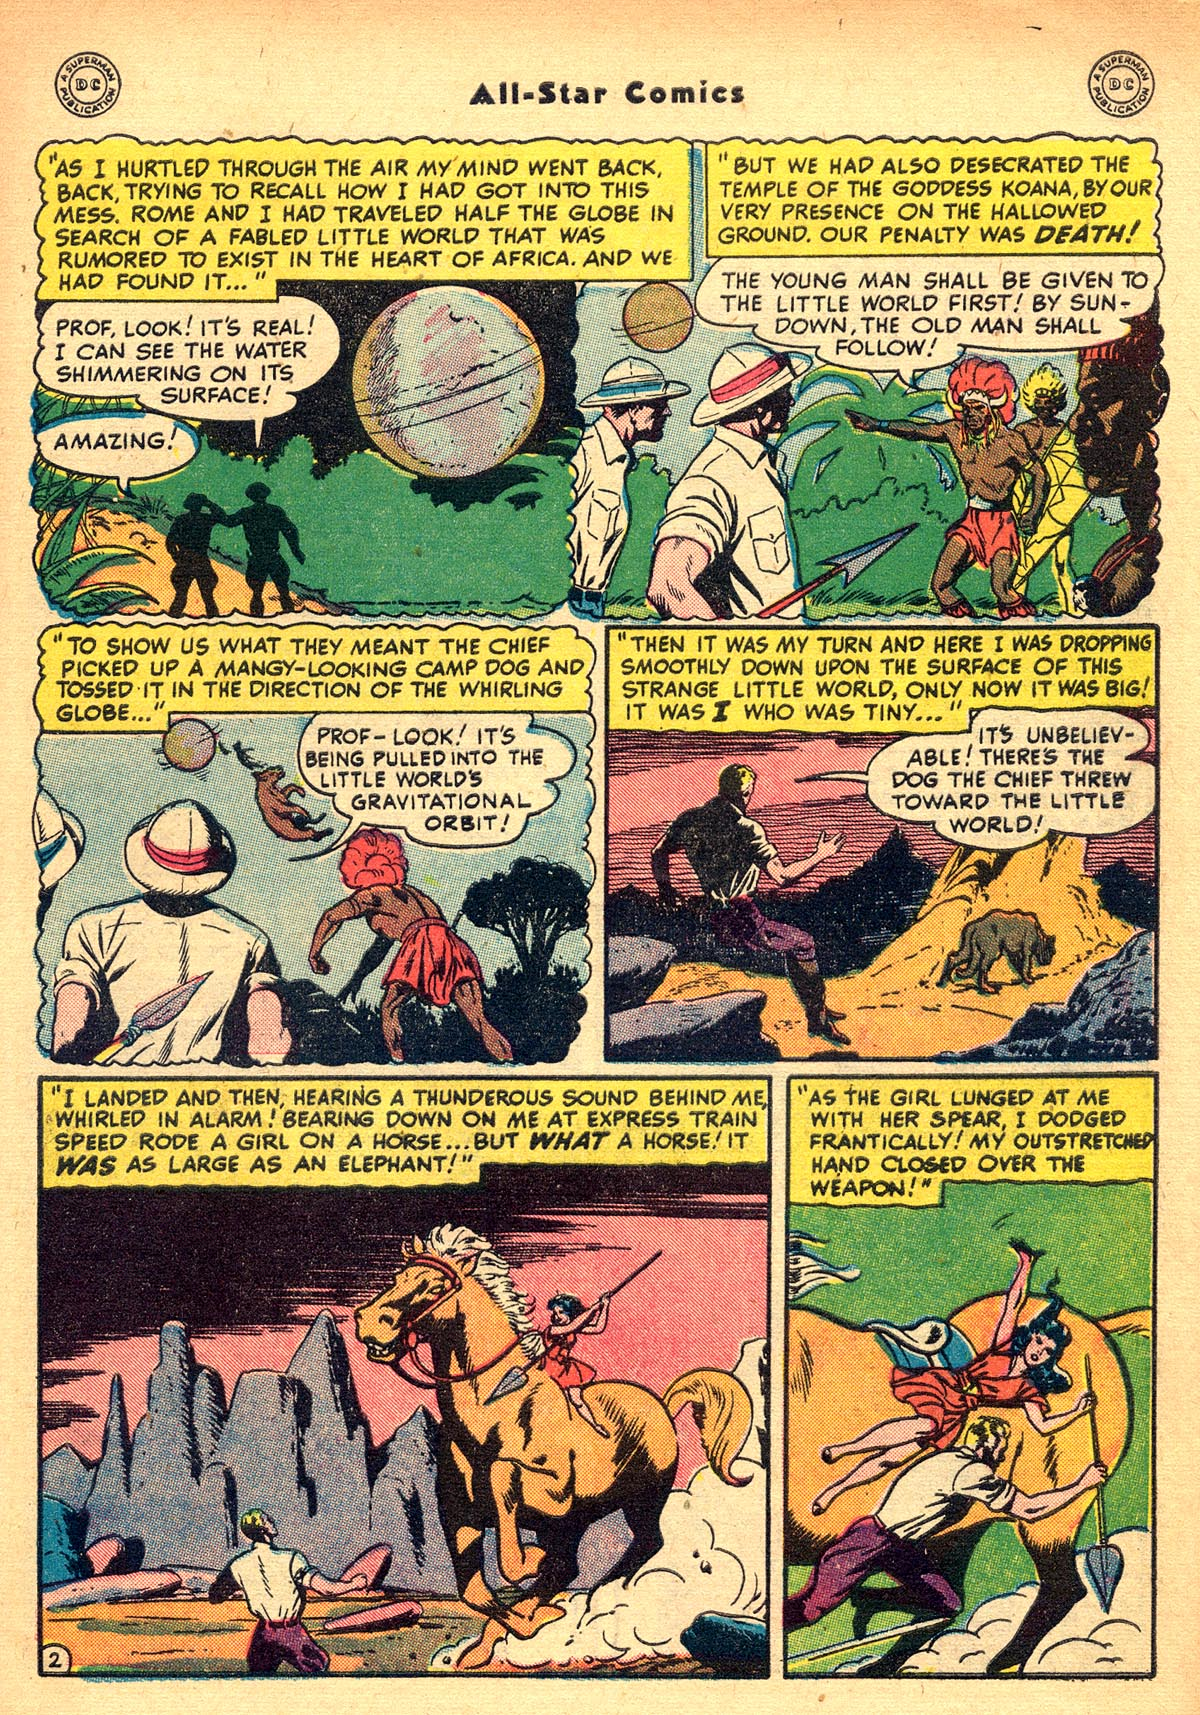 Read online All-Star Comics comic -  Issue #48 - 45